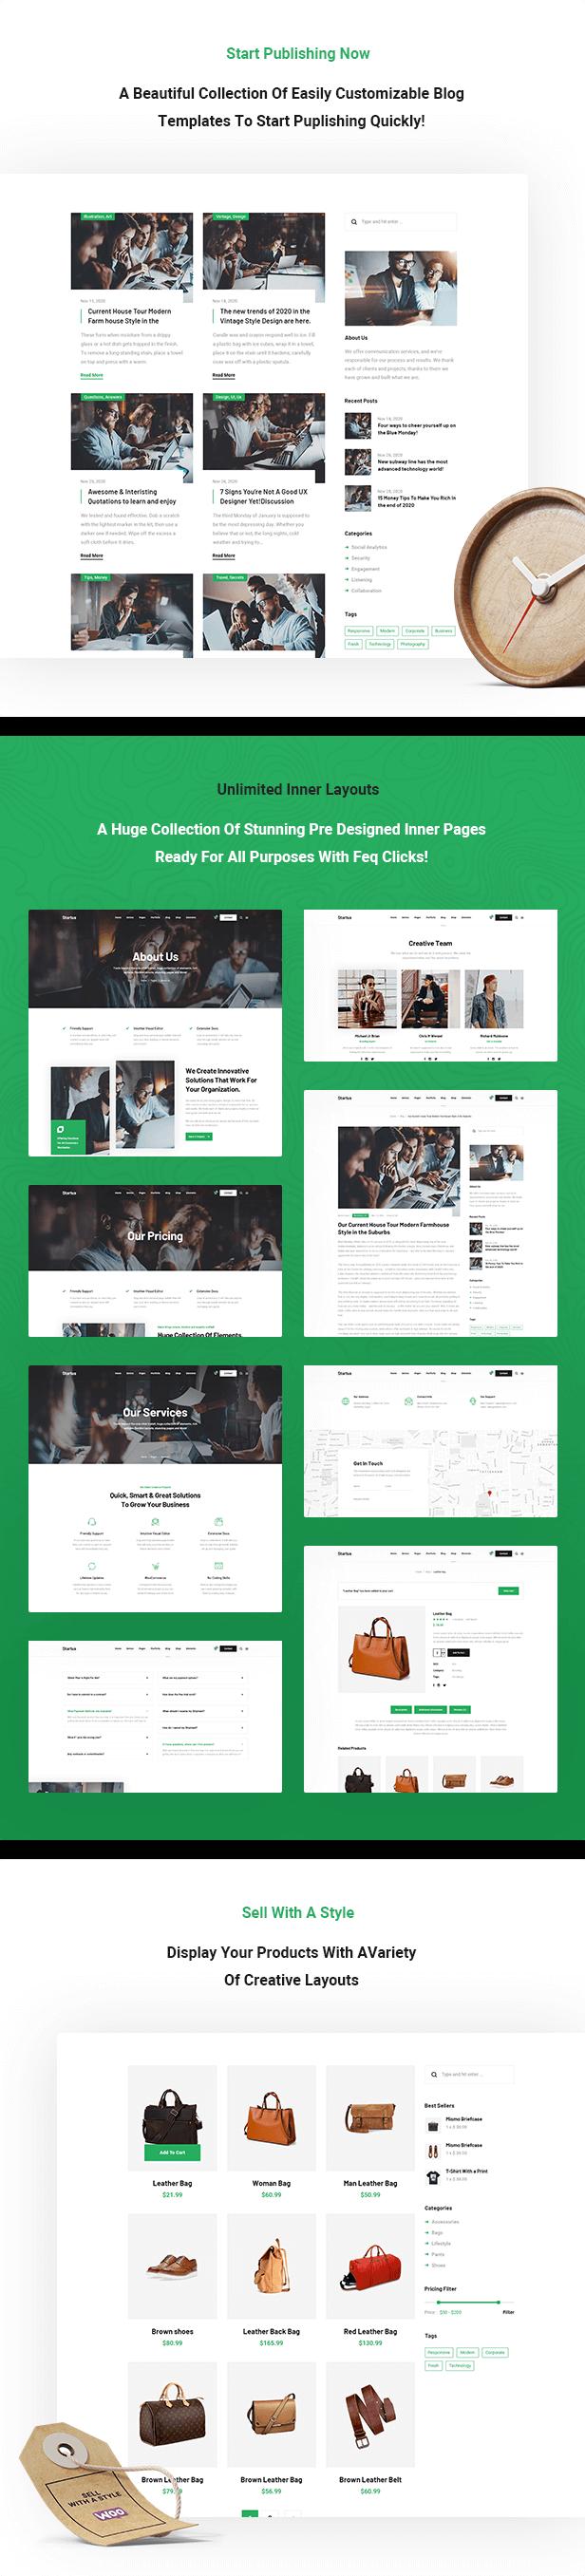 Startus - Multipurpose Business WordPress Theme - 2